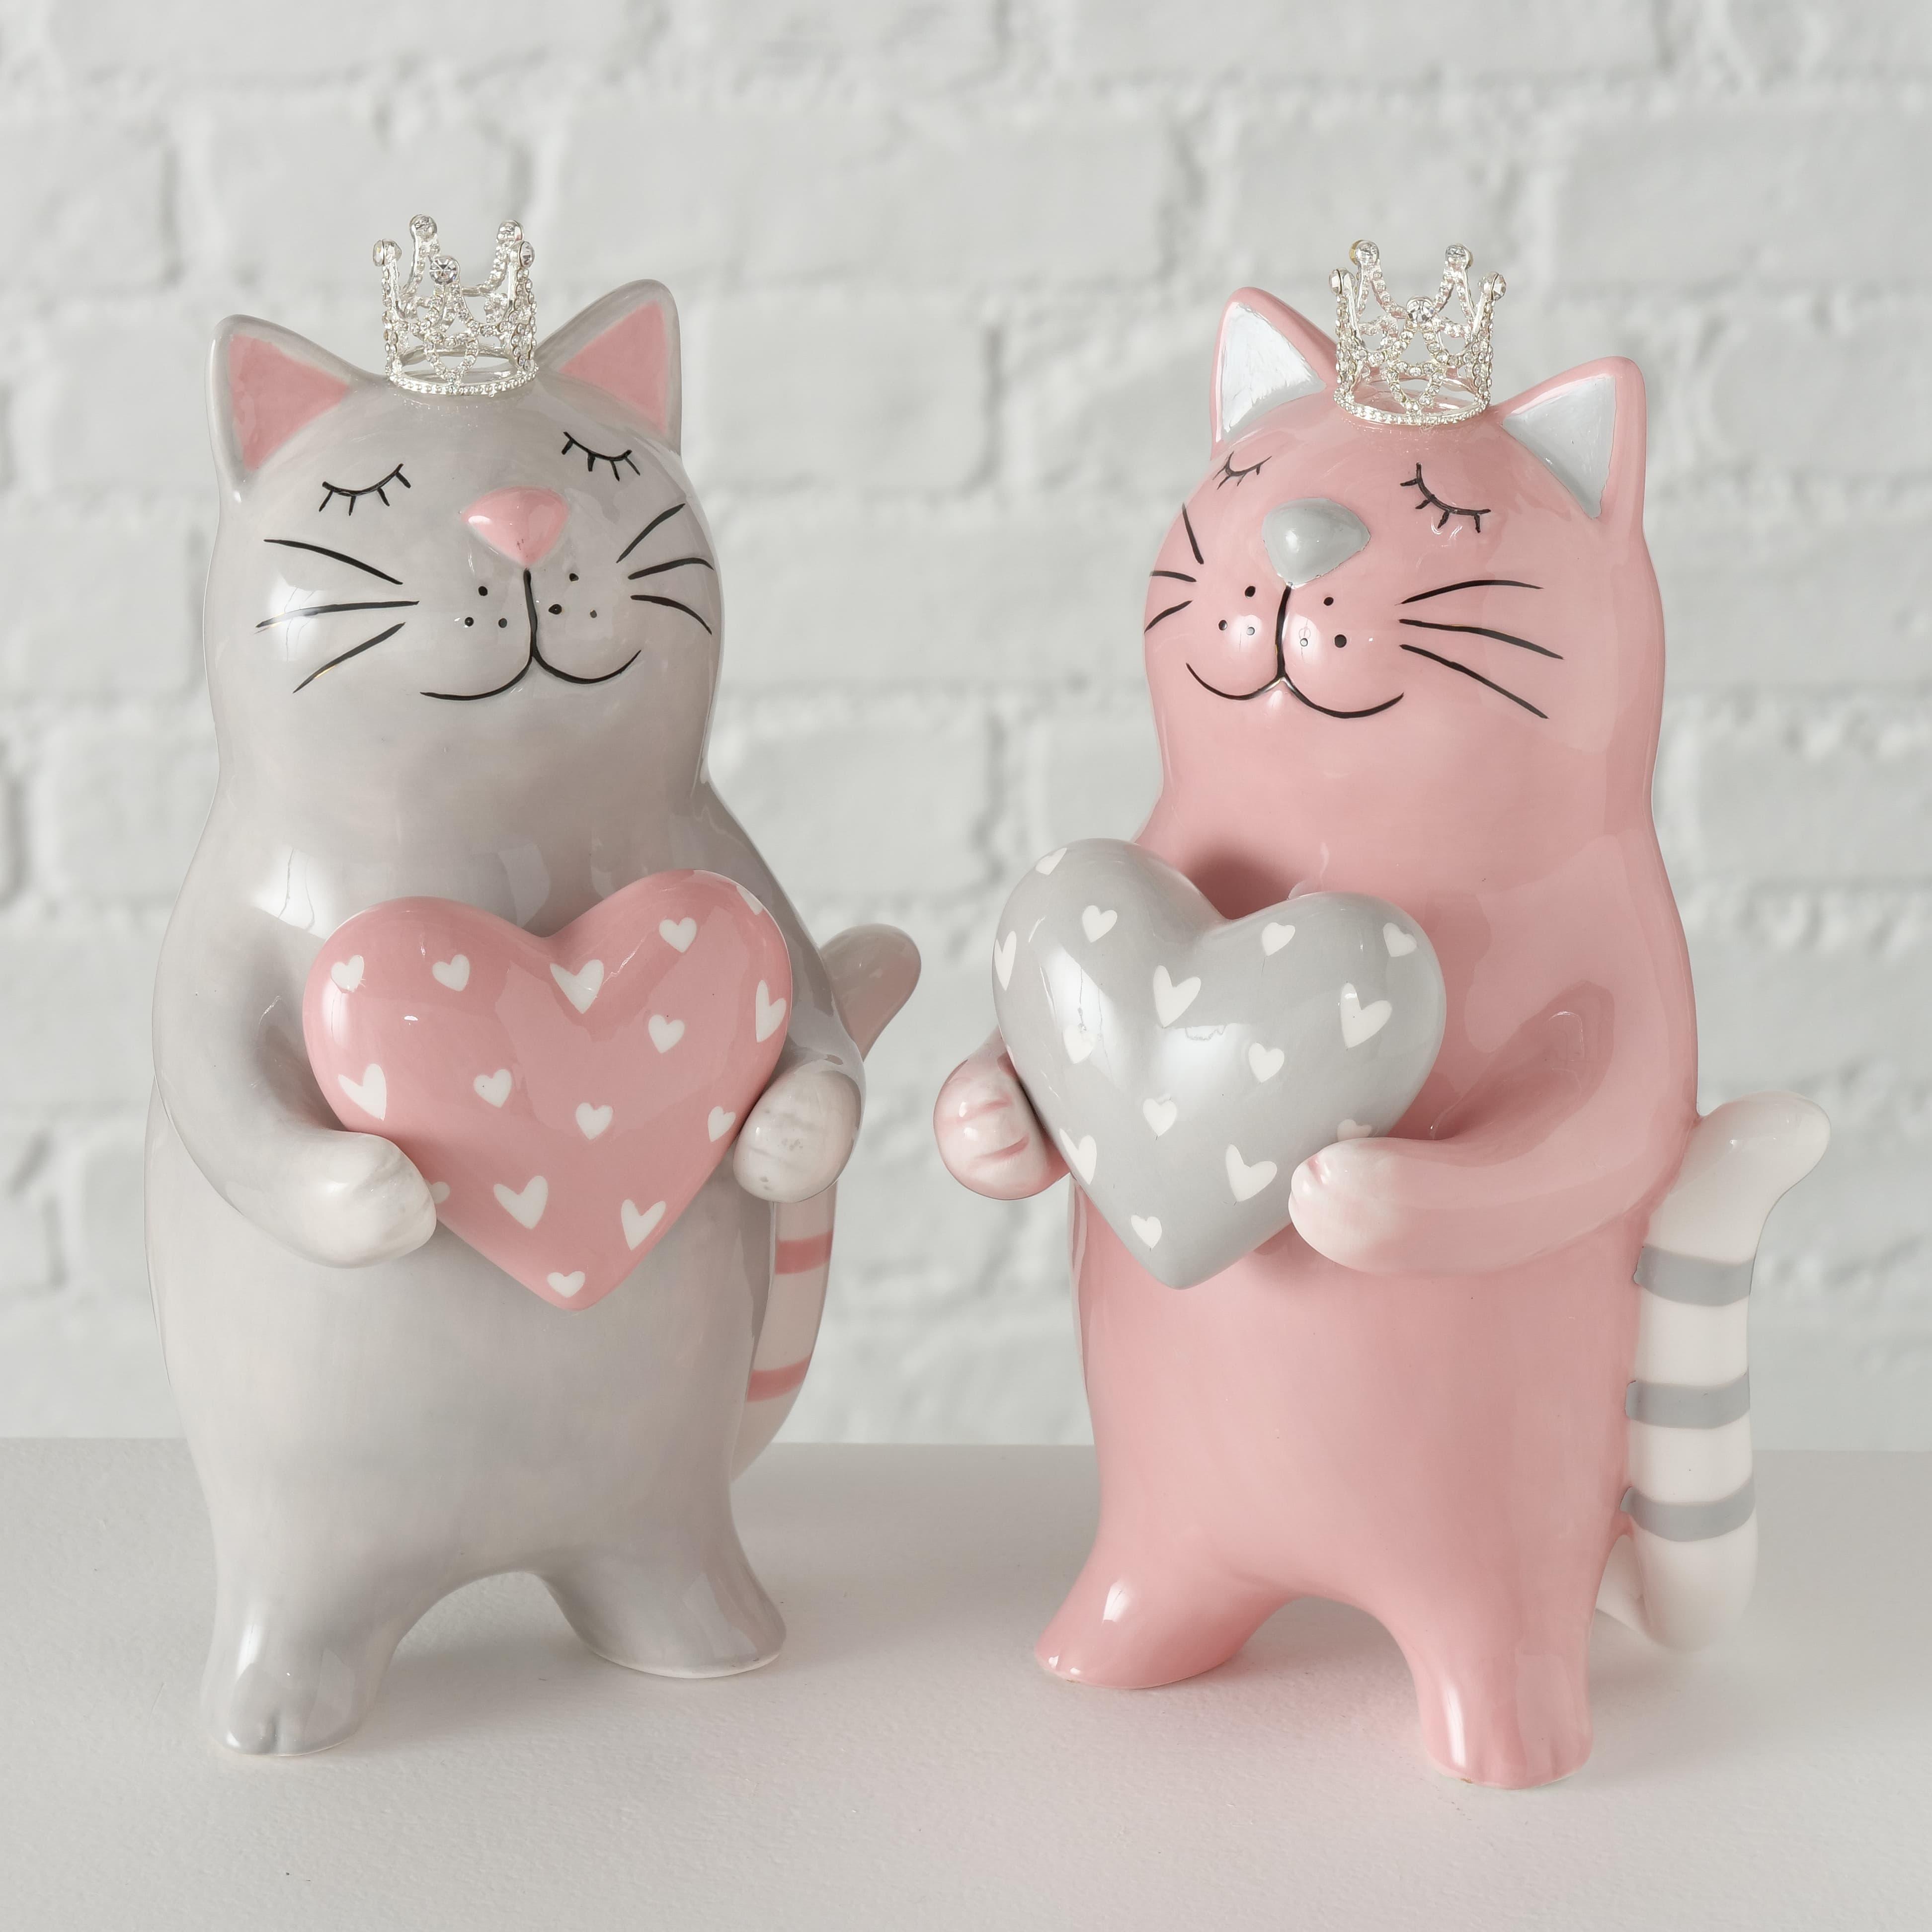 Figurina decorativa din ceramica Betsy Gri / Roz, Modele Asortate, l12xA11xH21 cm